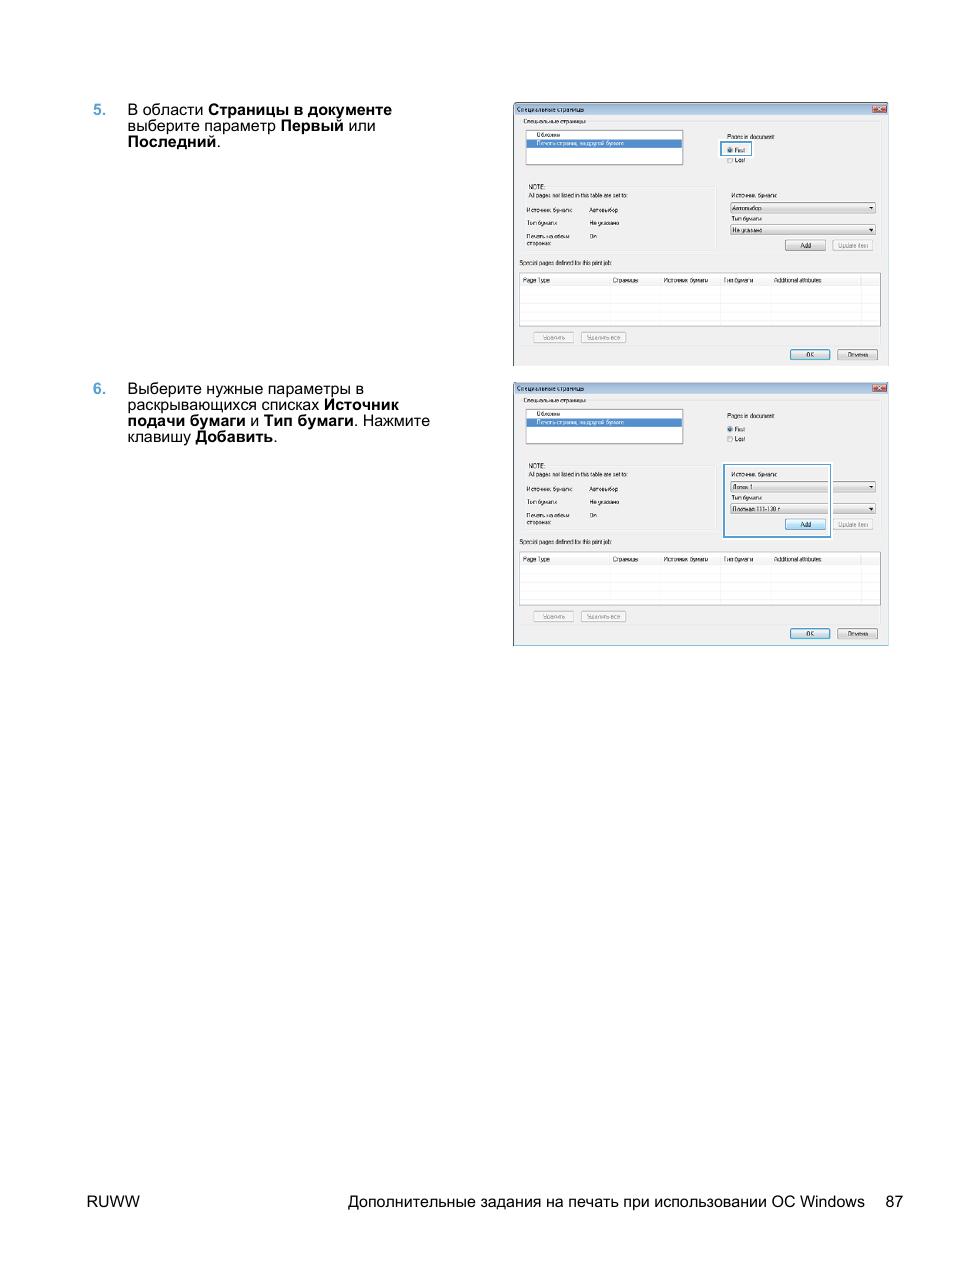 Инструкция по эксплуатации HP LaserJet Pro M1536dnf MFP SERIES Страница 101 / 322 Также для: LASERJET PRO M1530 MFP SERIES